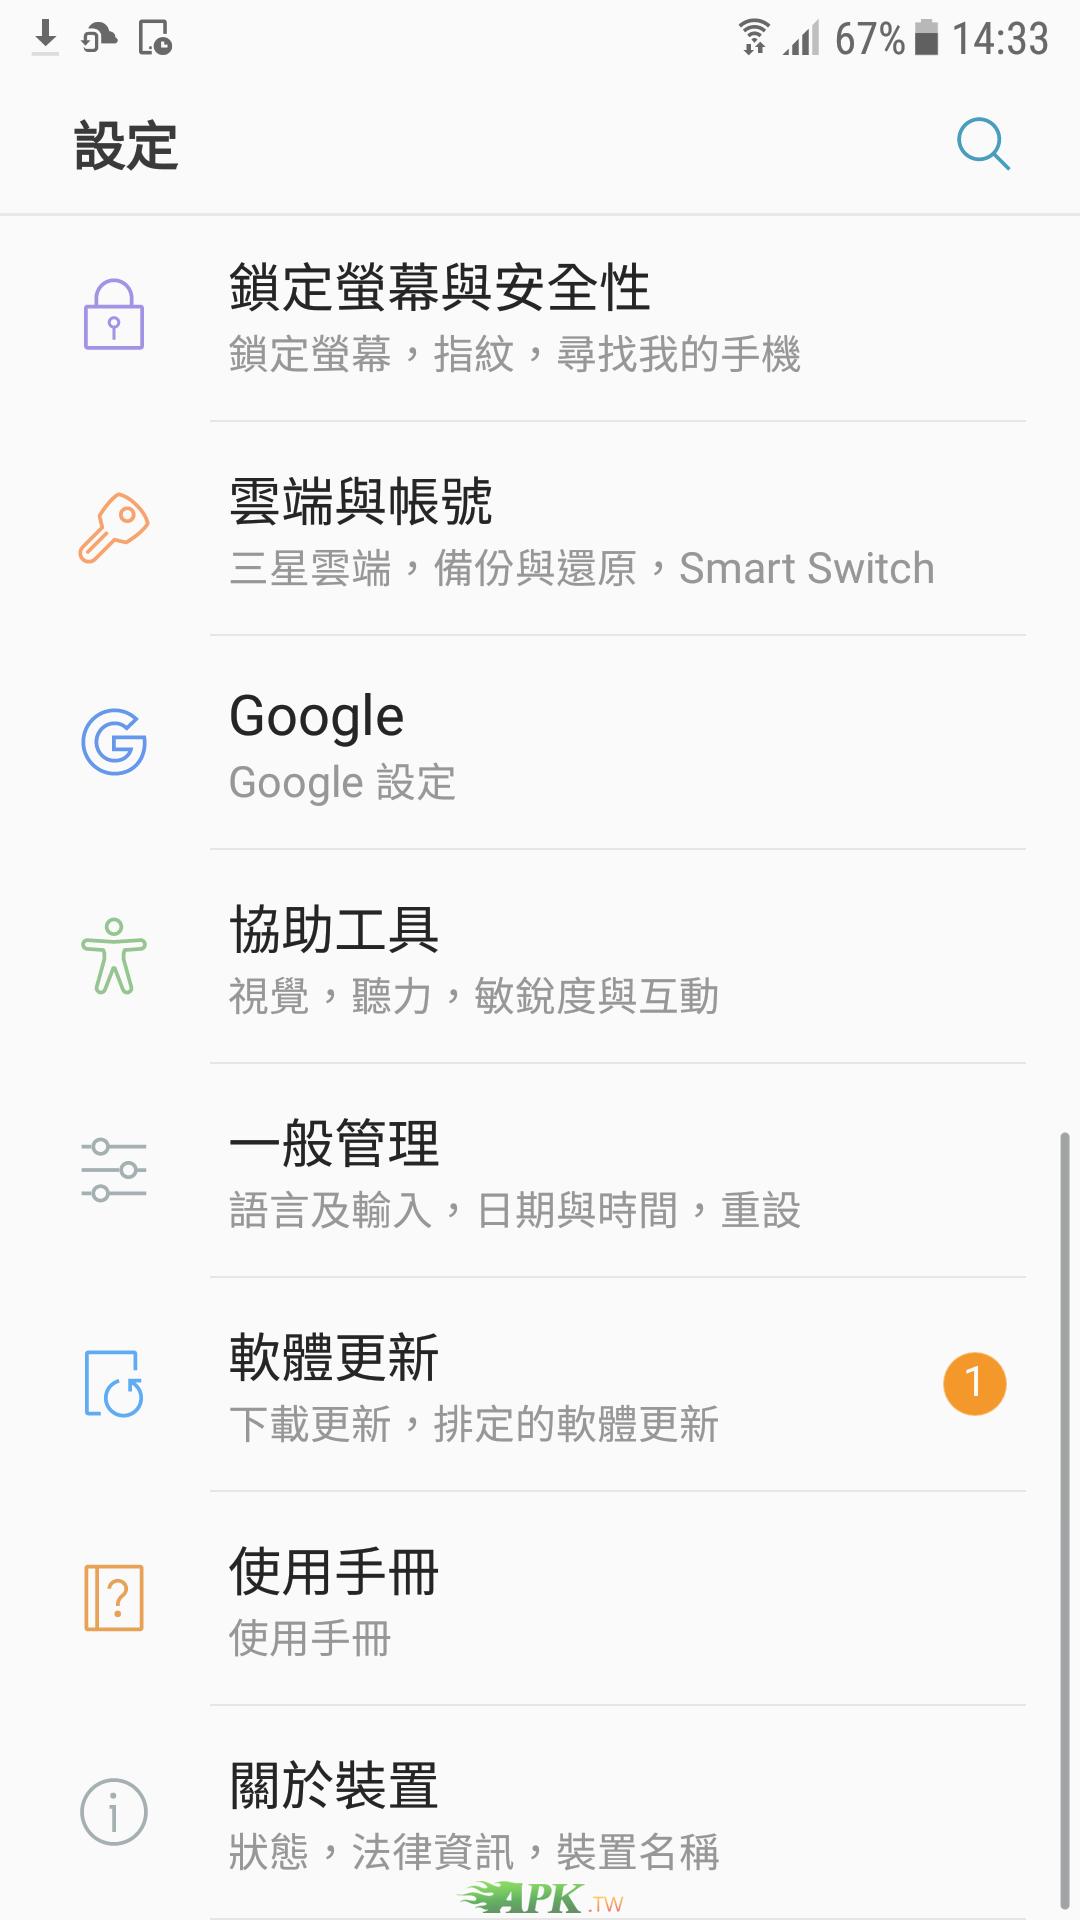 Screenshot_20170207-143323.png